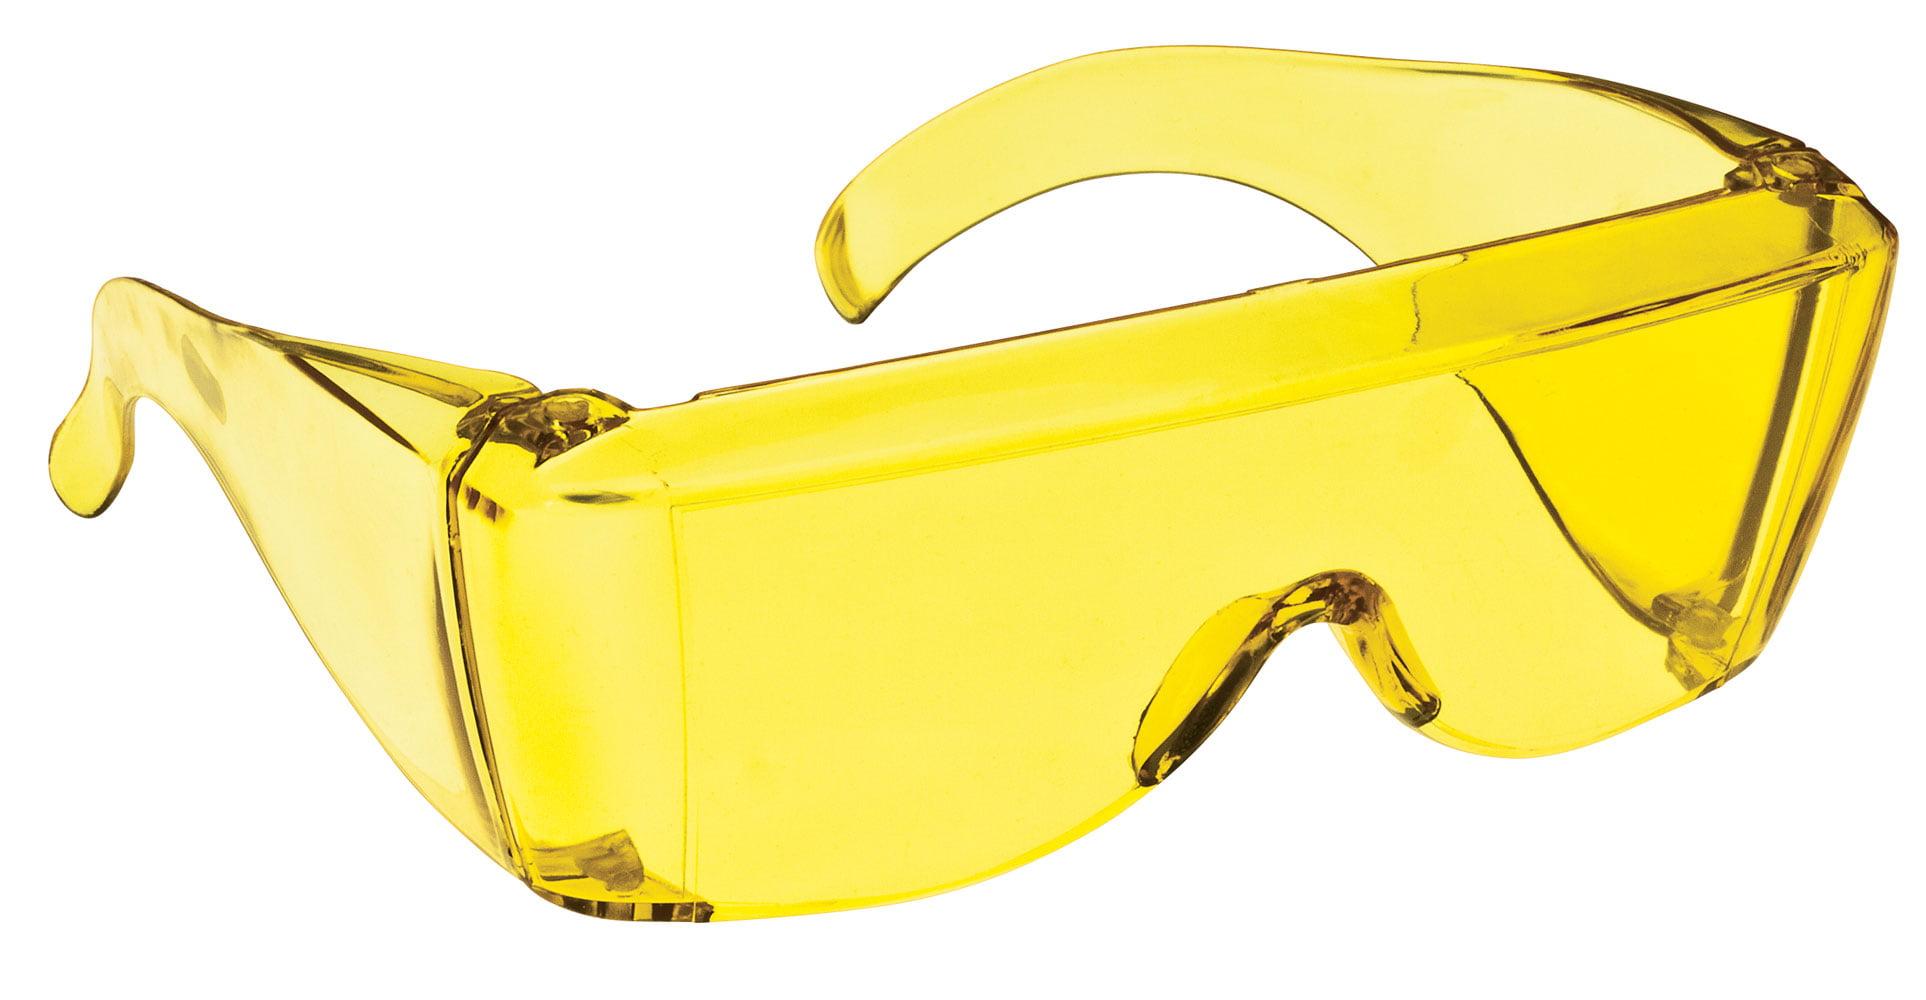 1f4a15688e0d Fox Valley Traders - Wraparound Night Driving Glasses - Walmart.com